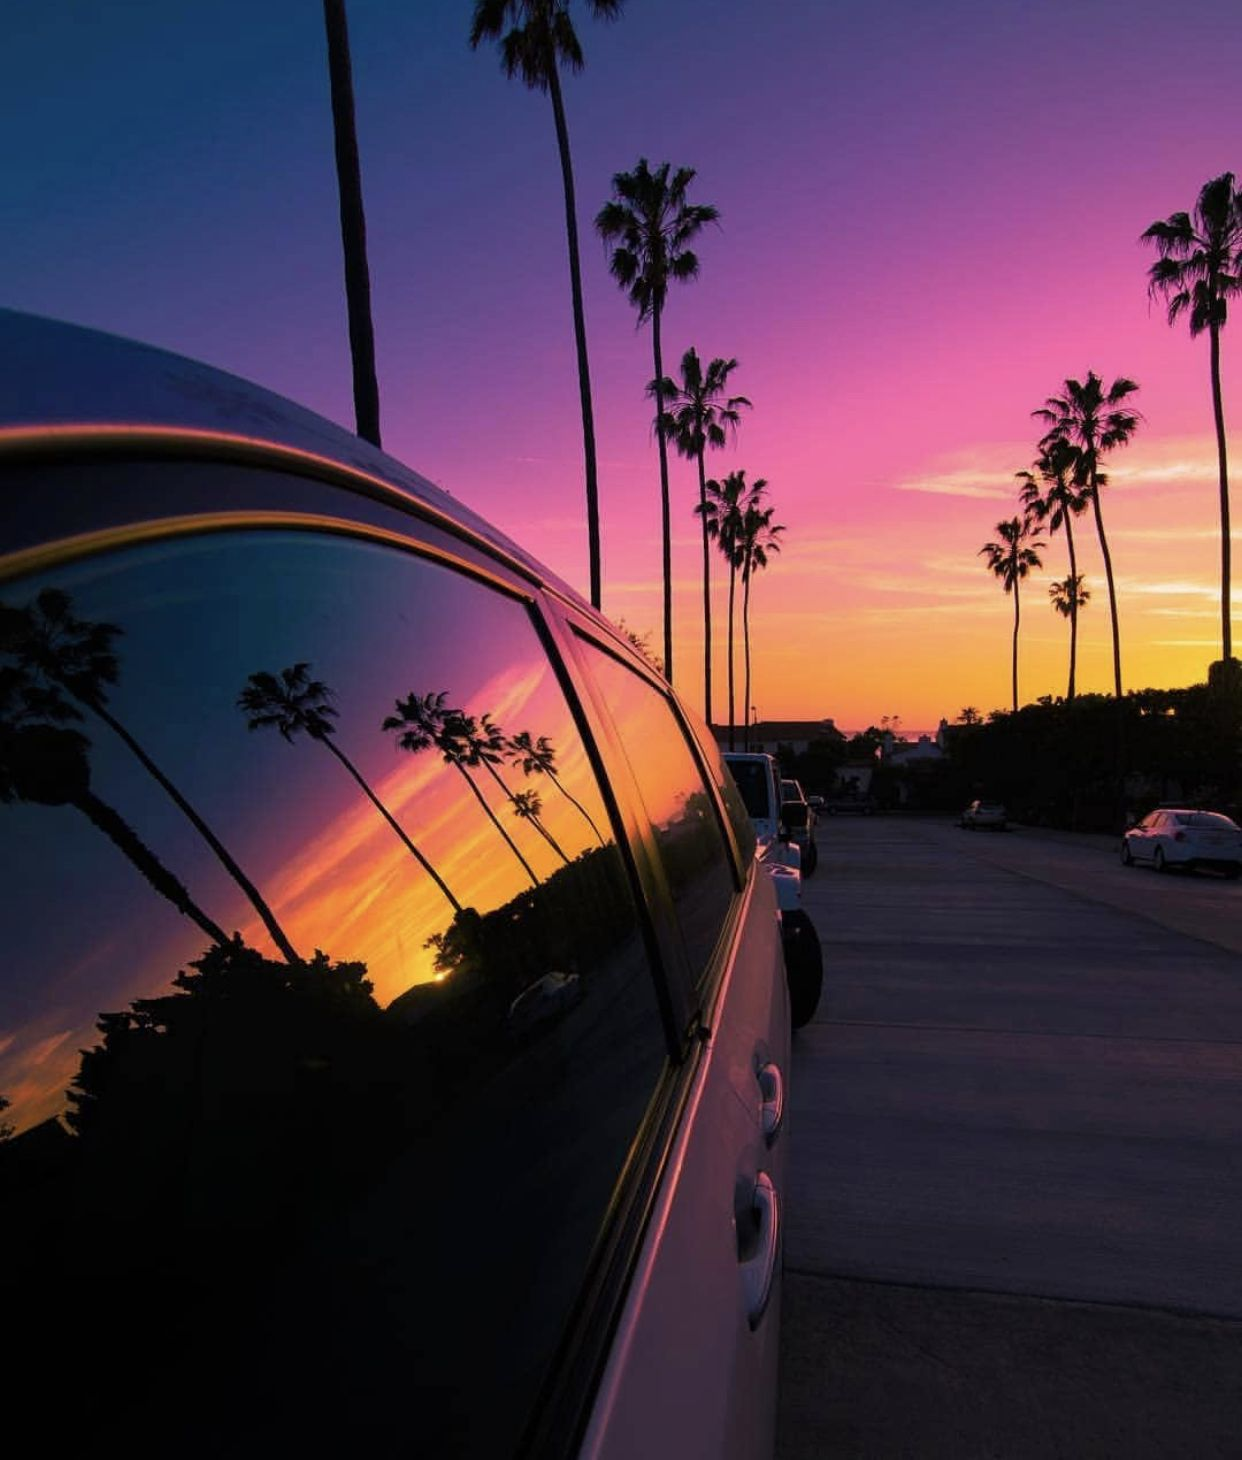 Pin By Dee Dee On The Sun Moon Sky Instagram San Diego Sunrise Sunset